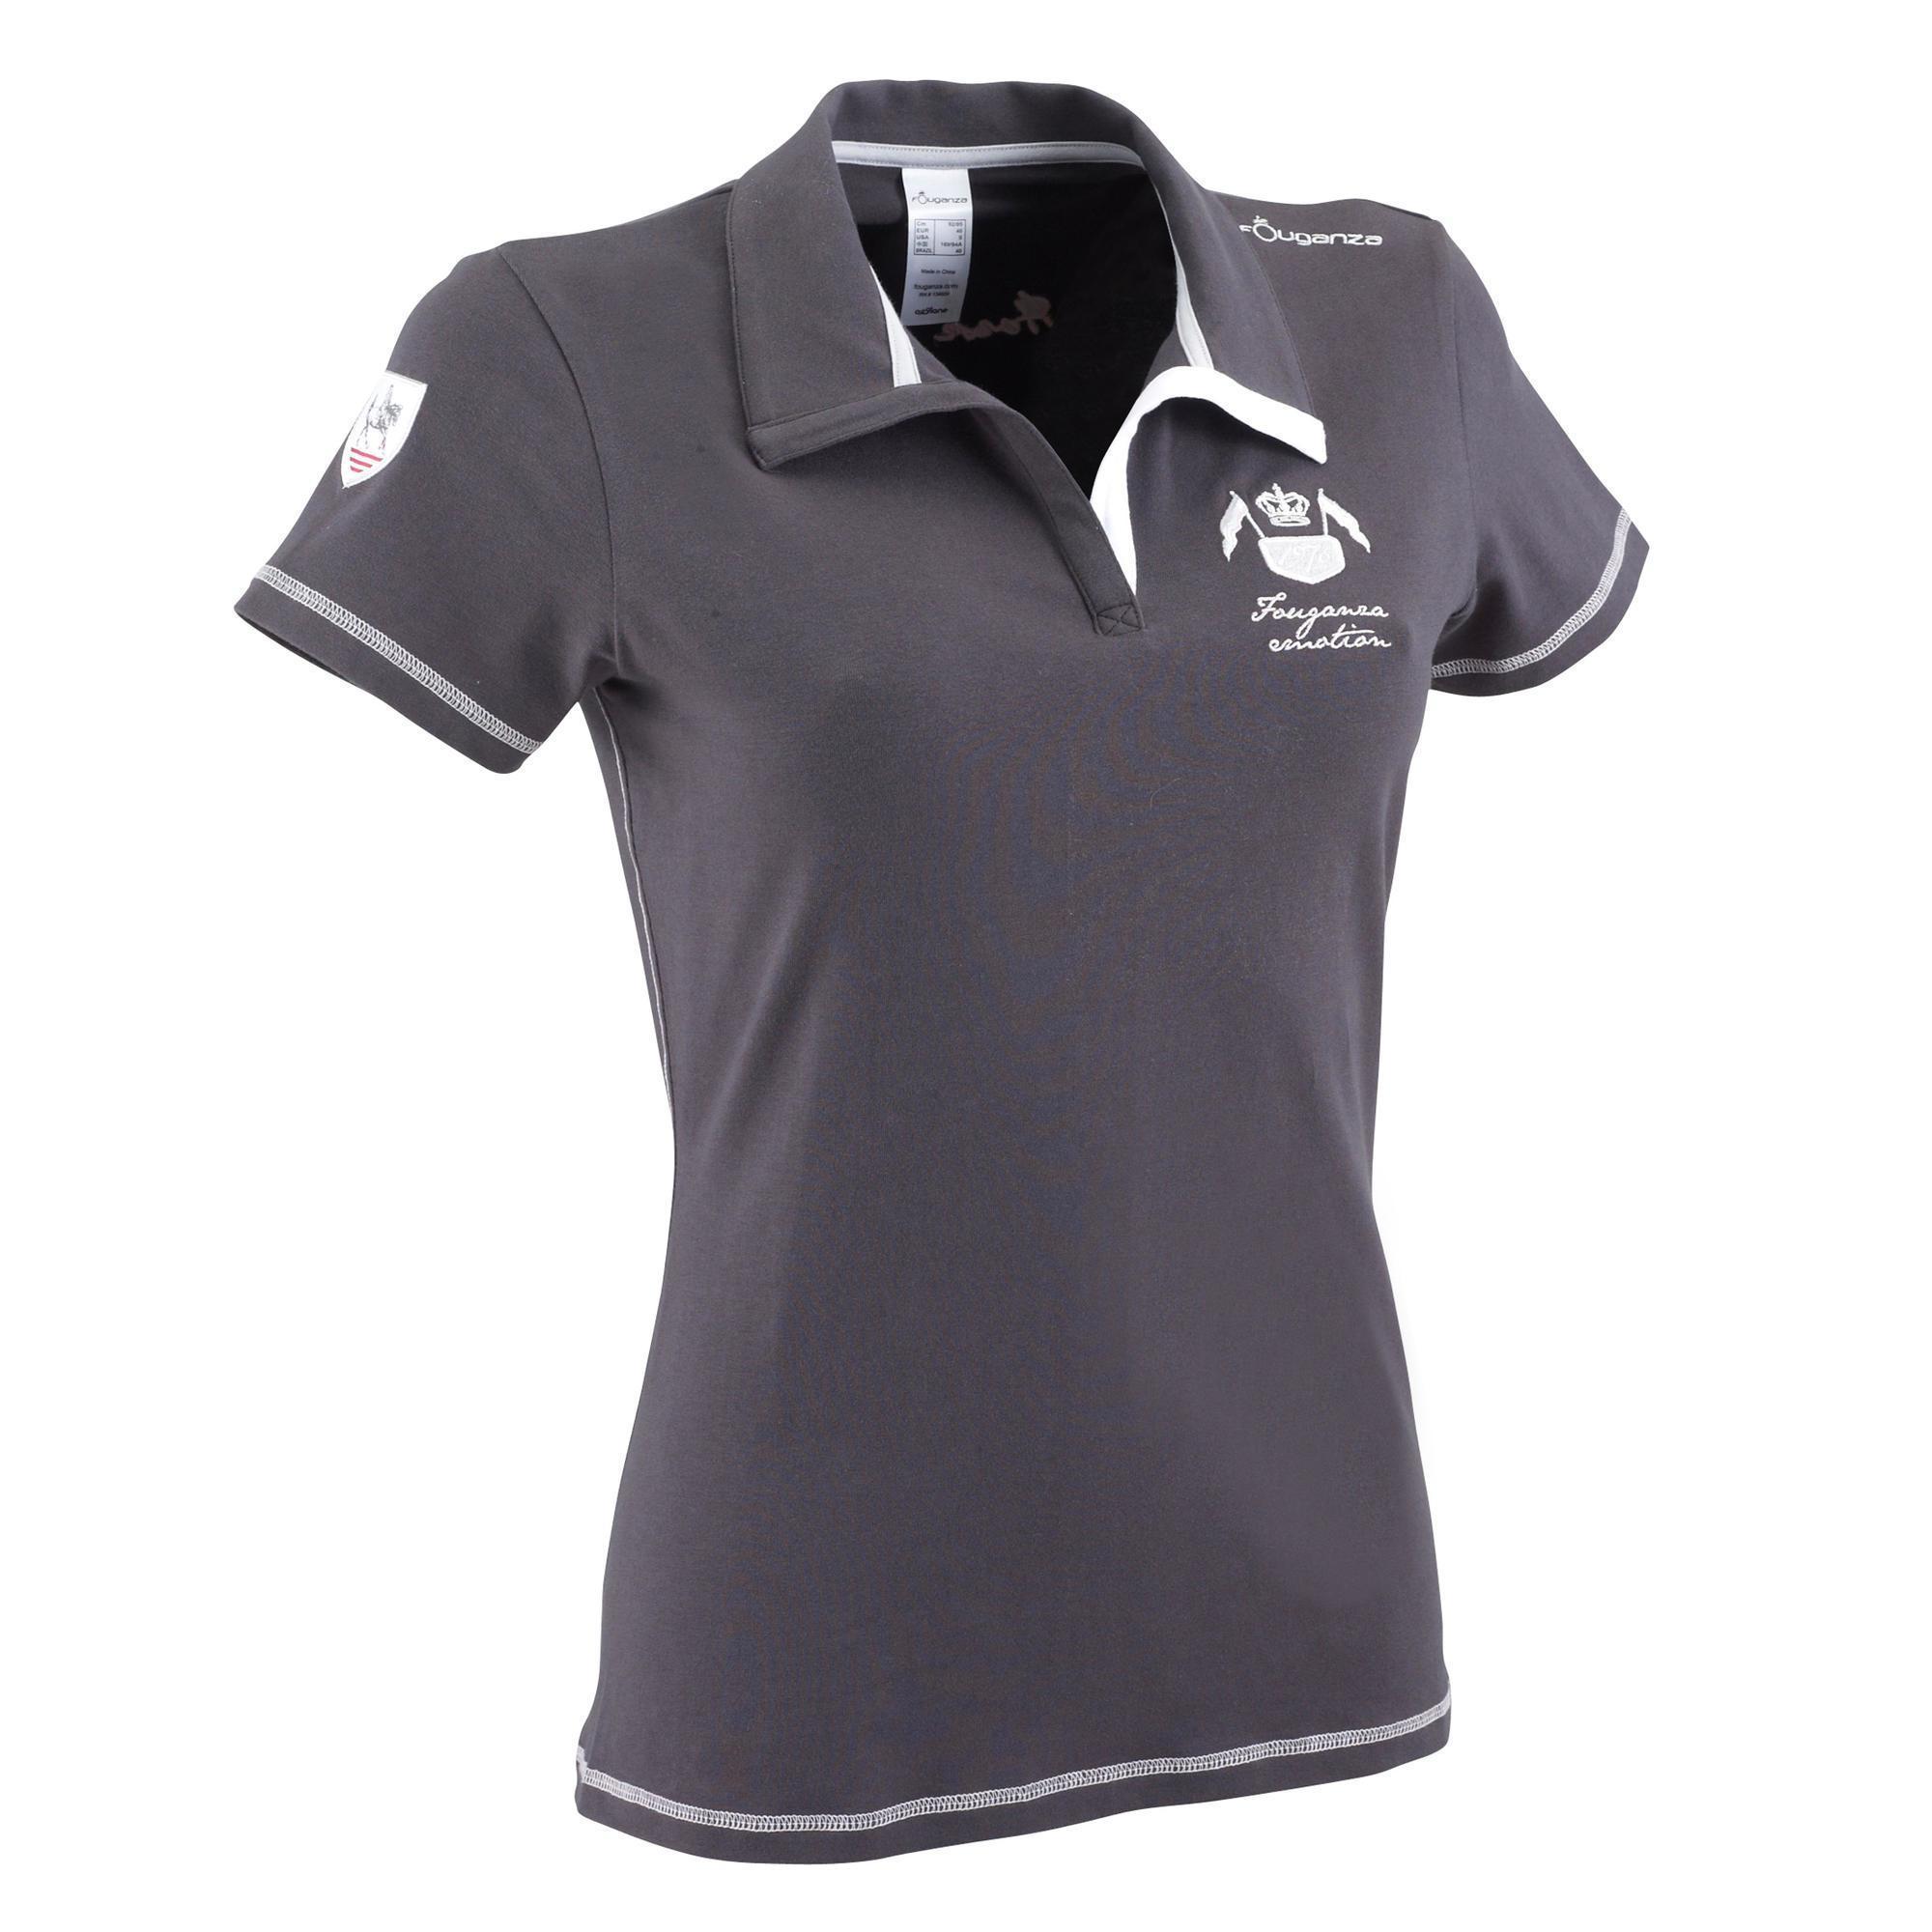 VINTAGE women s horse riding short-sleeved polo shirt - dark grey ... 886cd374a5